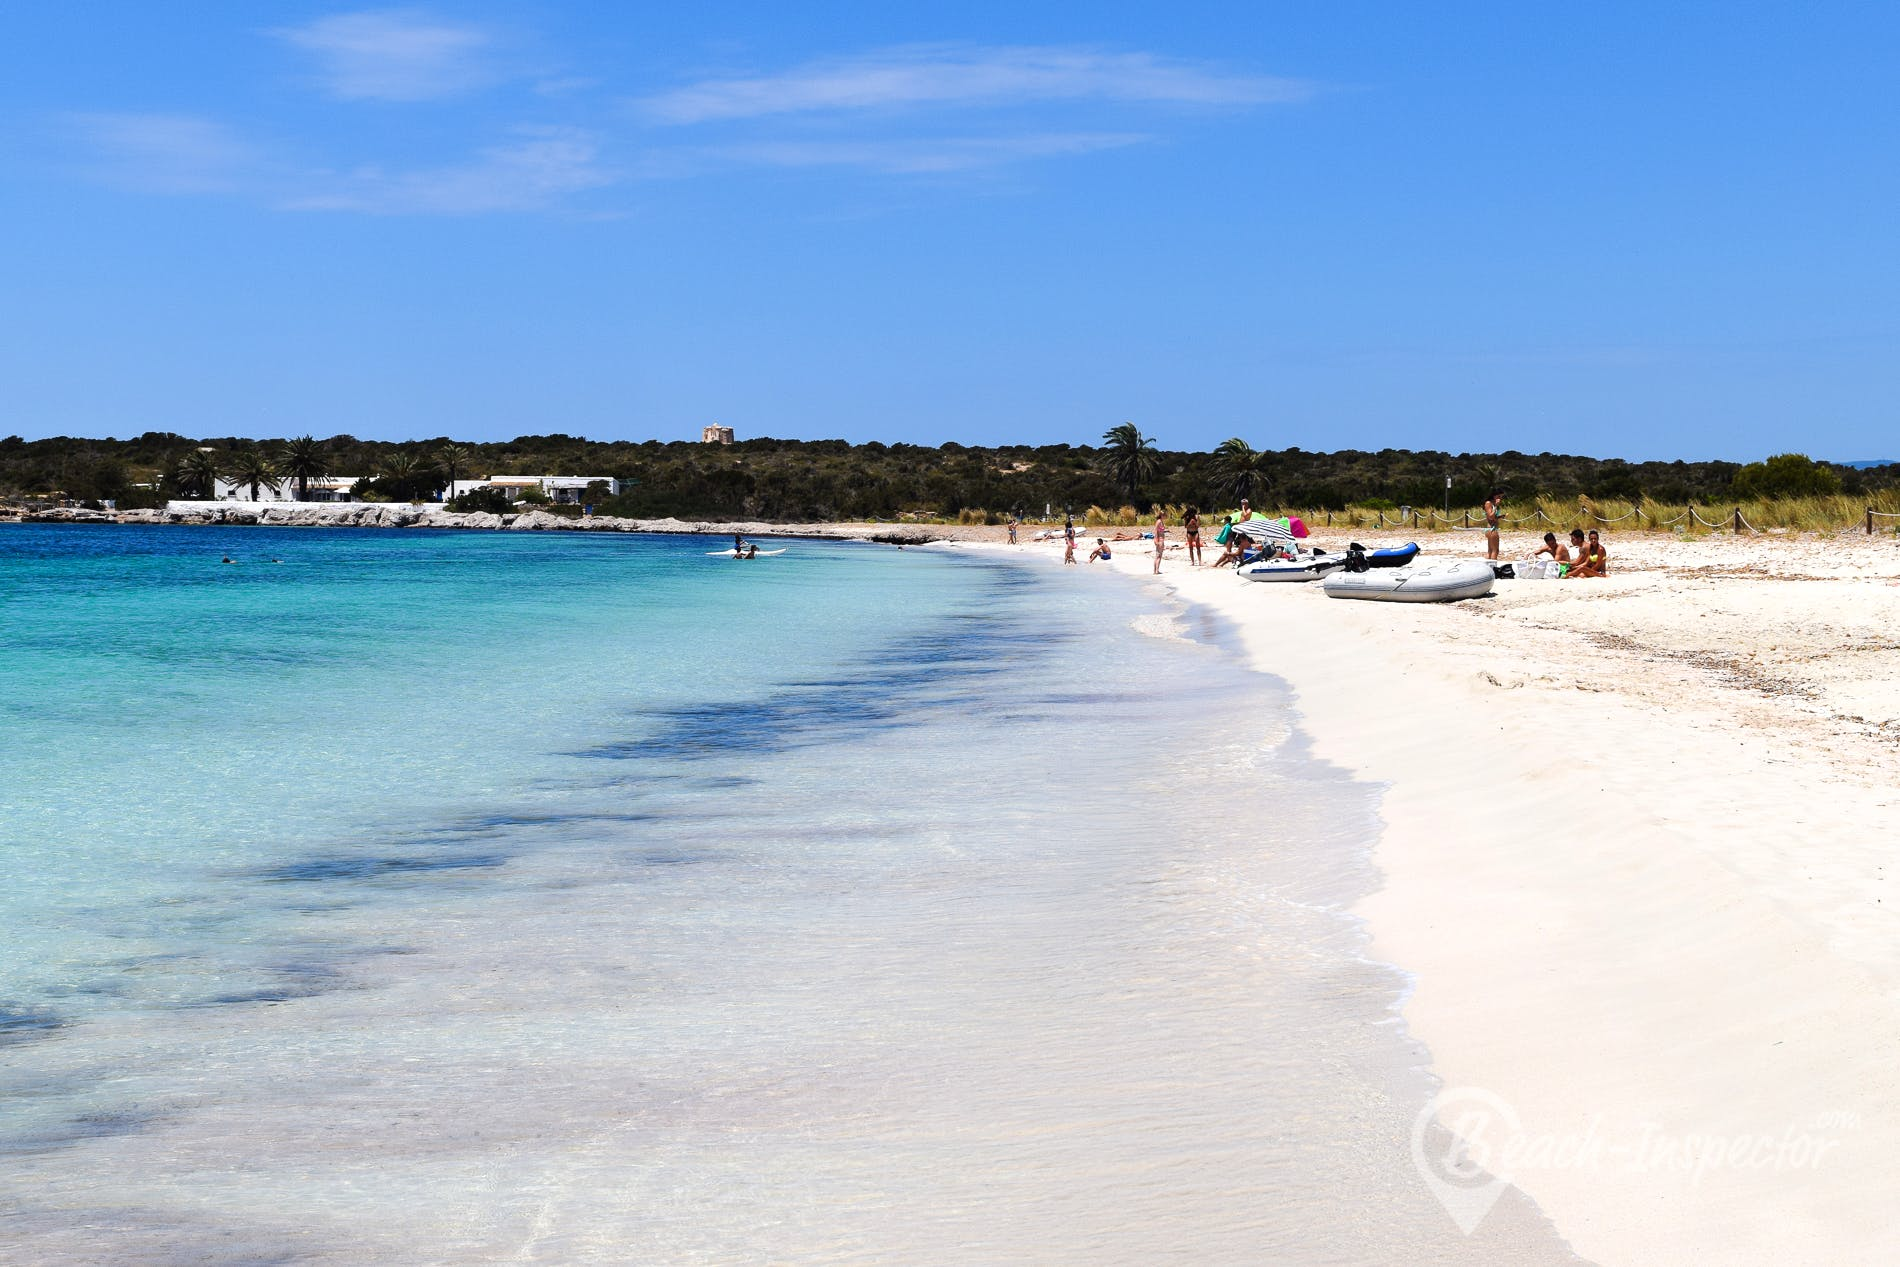 Beach Playa de Espalmador, Formentera, Spain